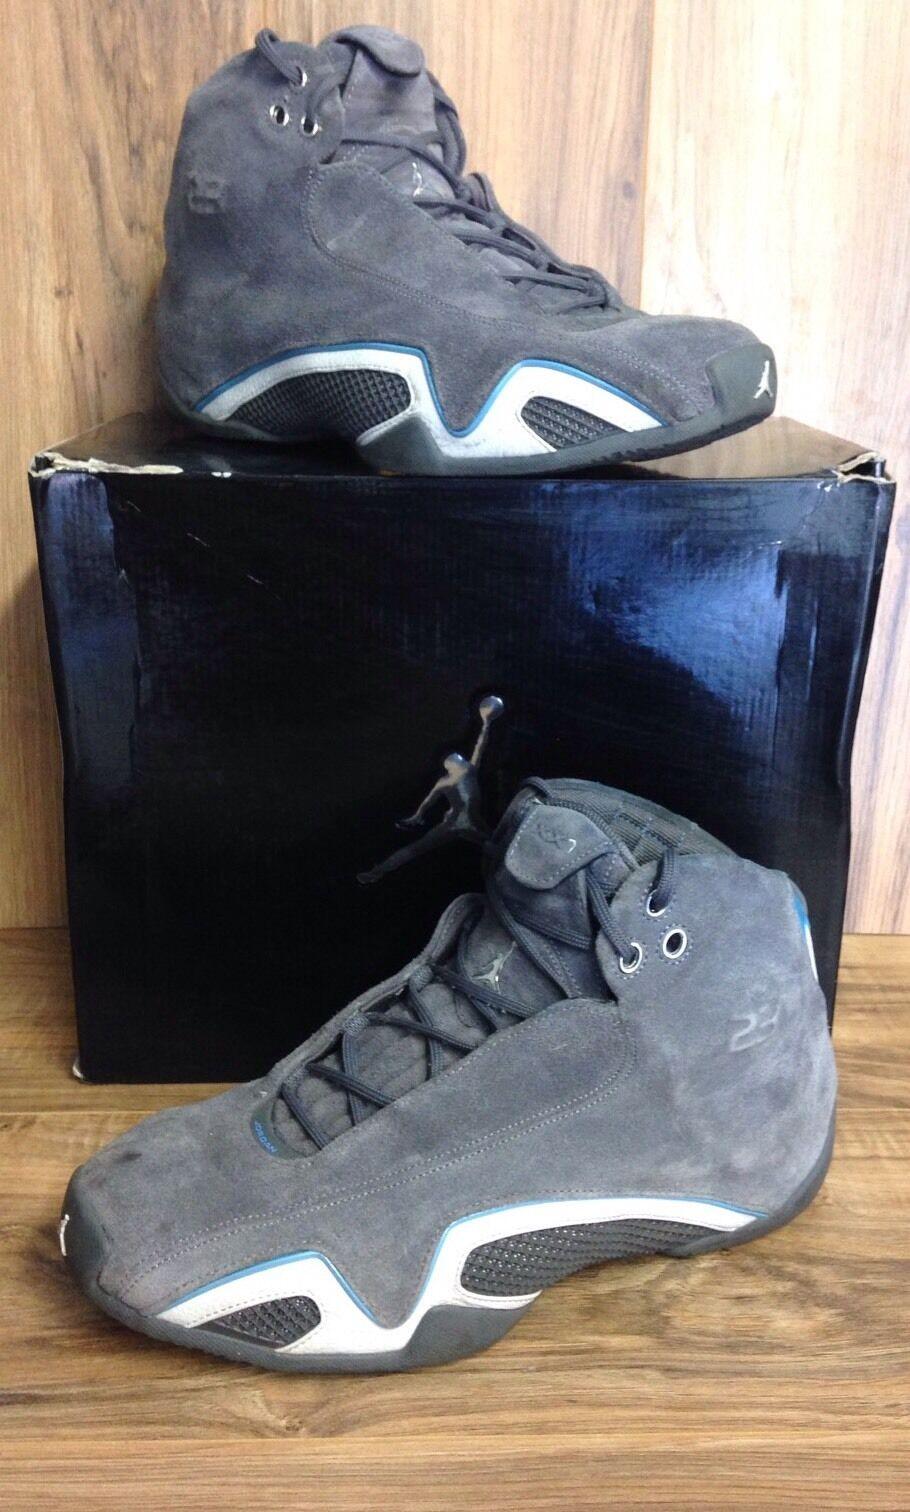 Raro nike air jordan xxi 21 grafite grigio argento univ 313495-002 blu